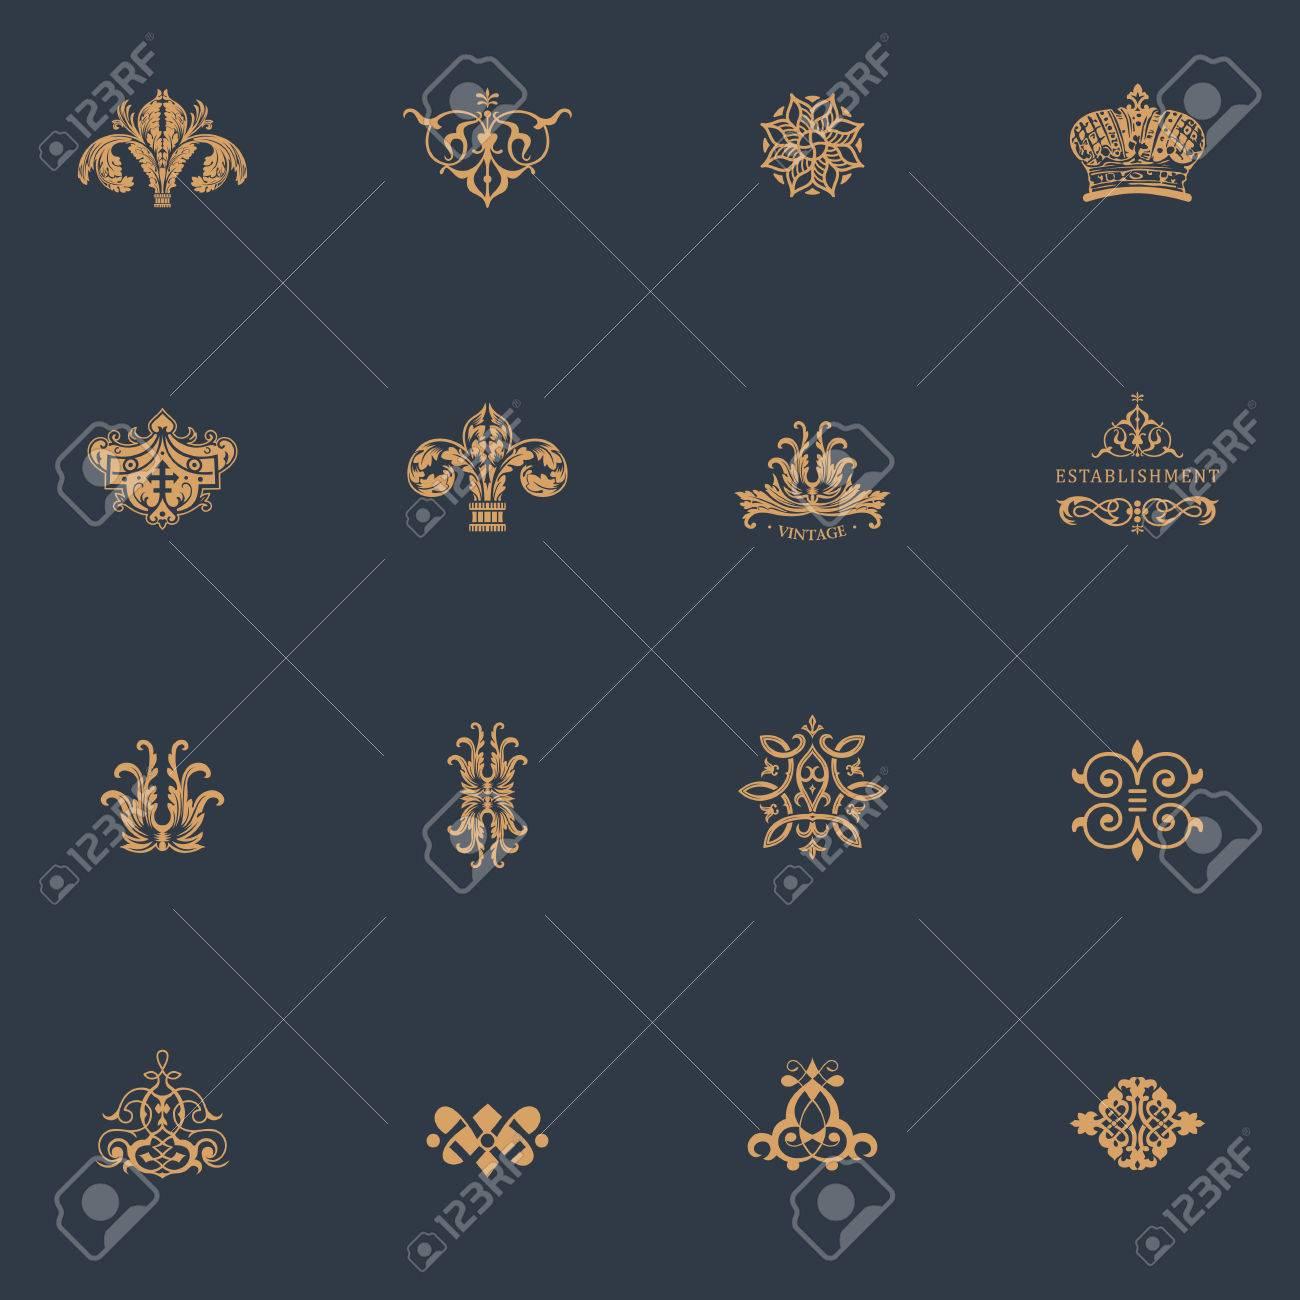 Luxury vintage logo set. Calligraphic emblems and elements elegant decor. Vector ornament for letter - 55350120